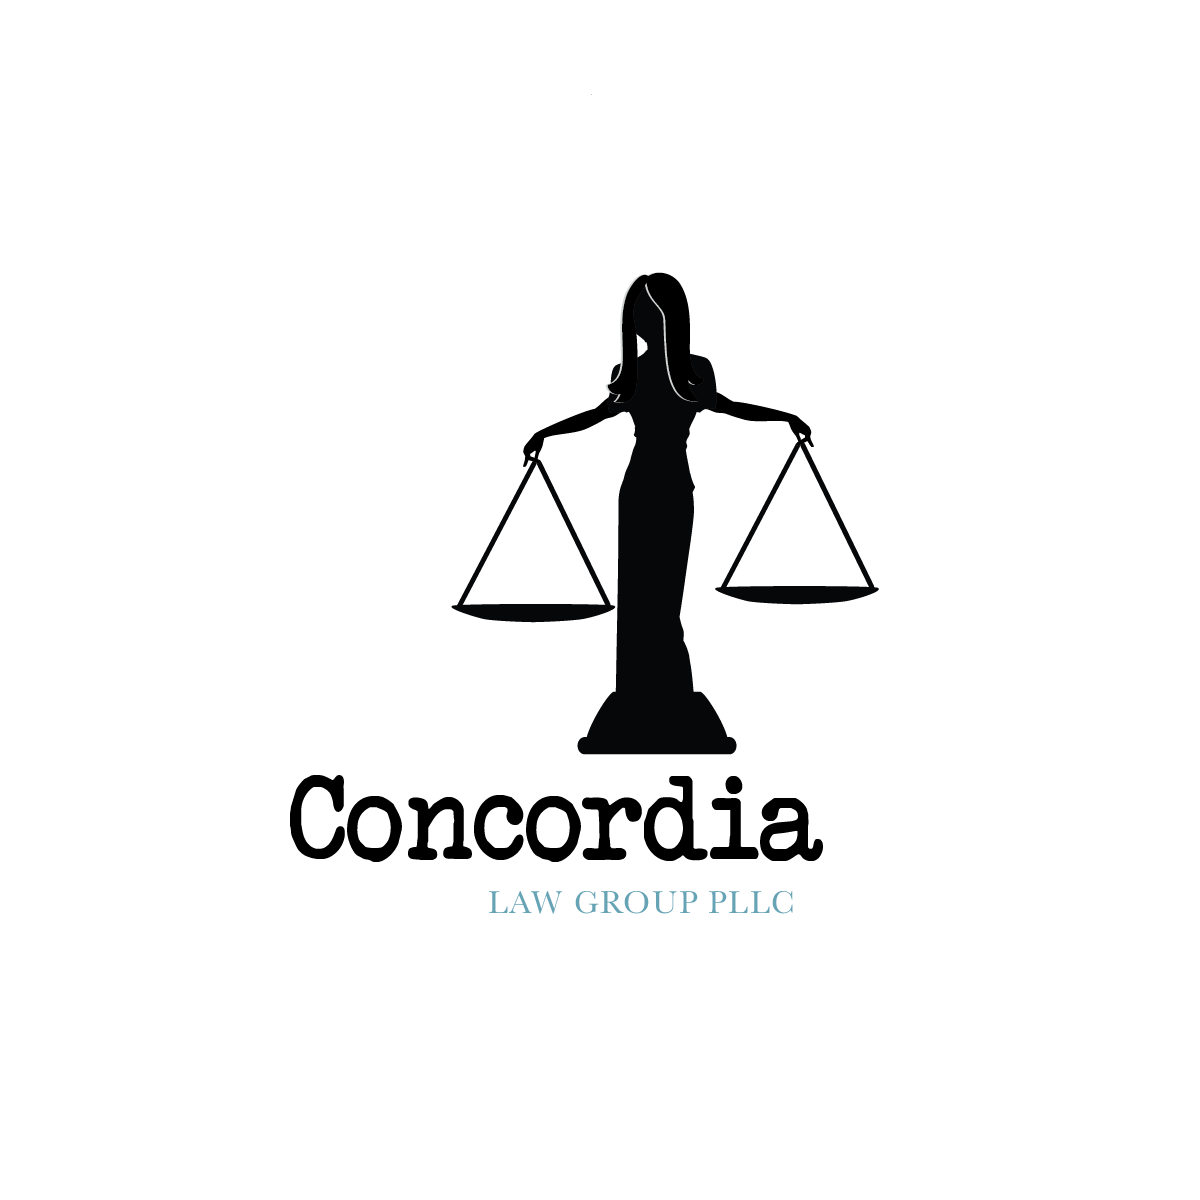 Concordia Law Group PLLC